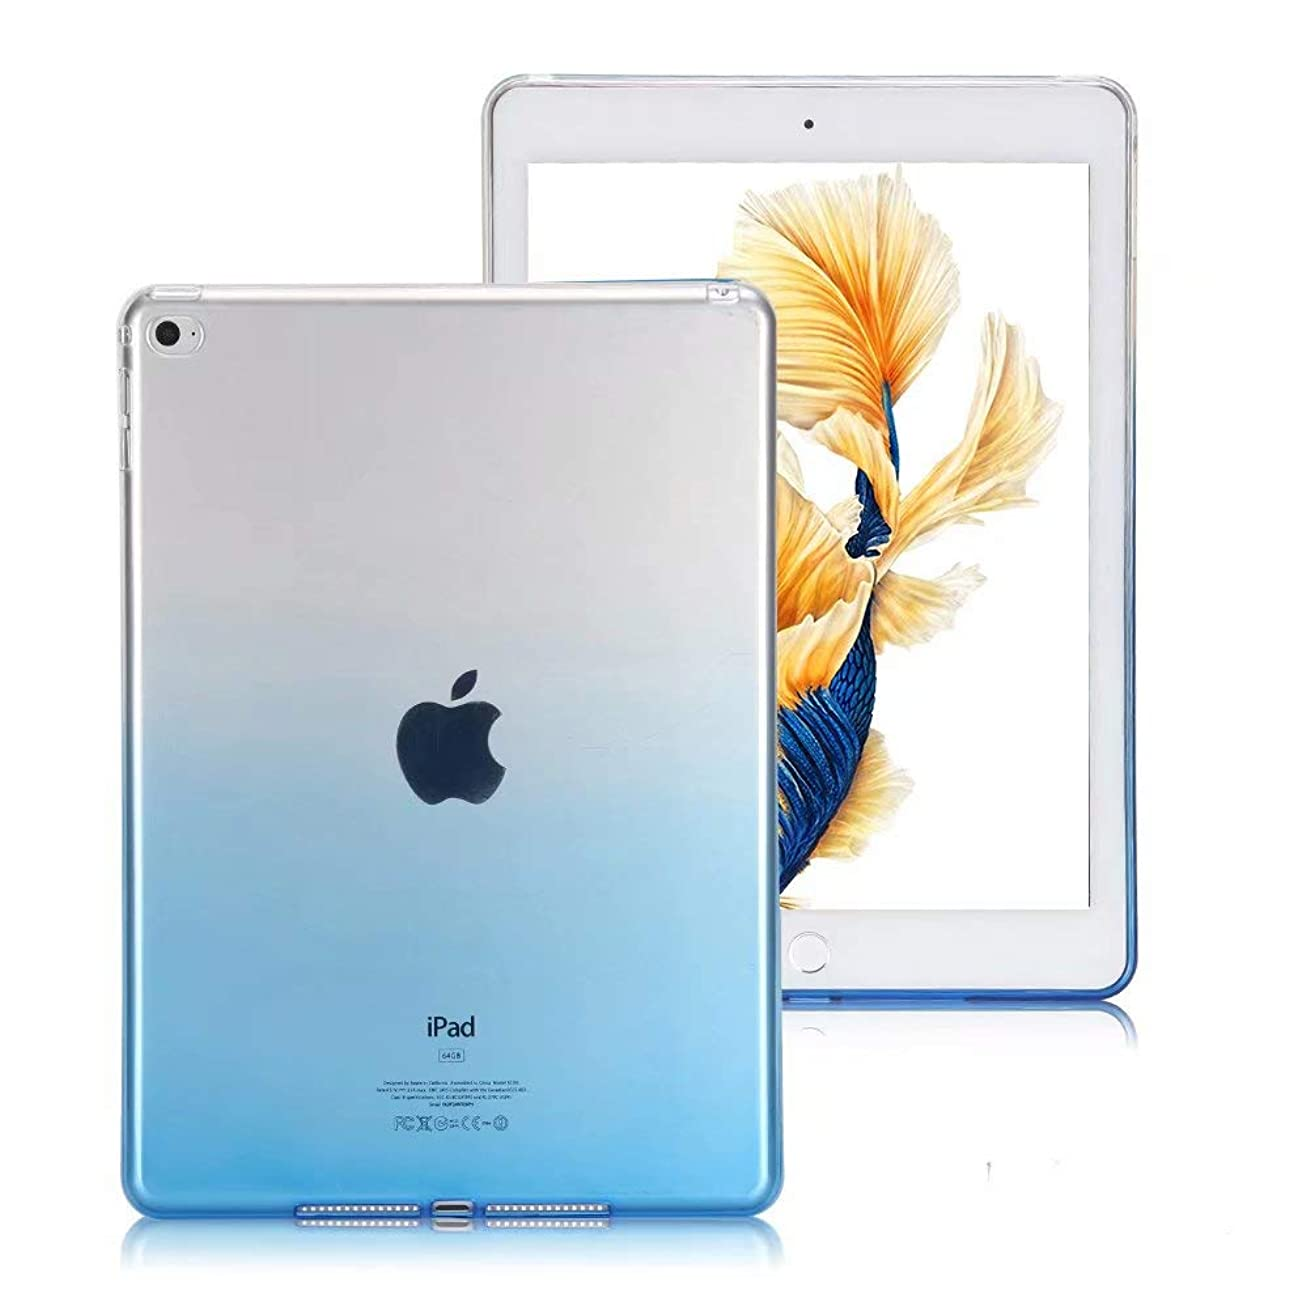 iPad Air Case, VMAE Soft TPU Flexible Transparent Bumper, Gradient Color Ultra Thin Rubber Clear Back Cover Protector for Apple iPad Air 1/iPad 5 2013 Model - Gradient Blue